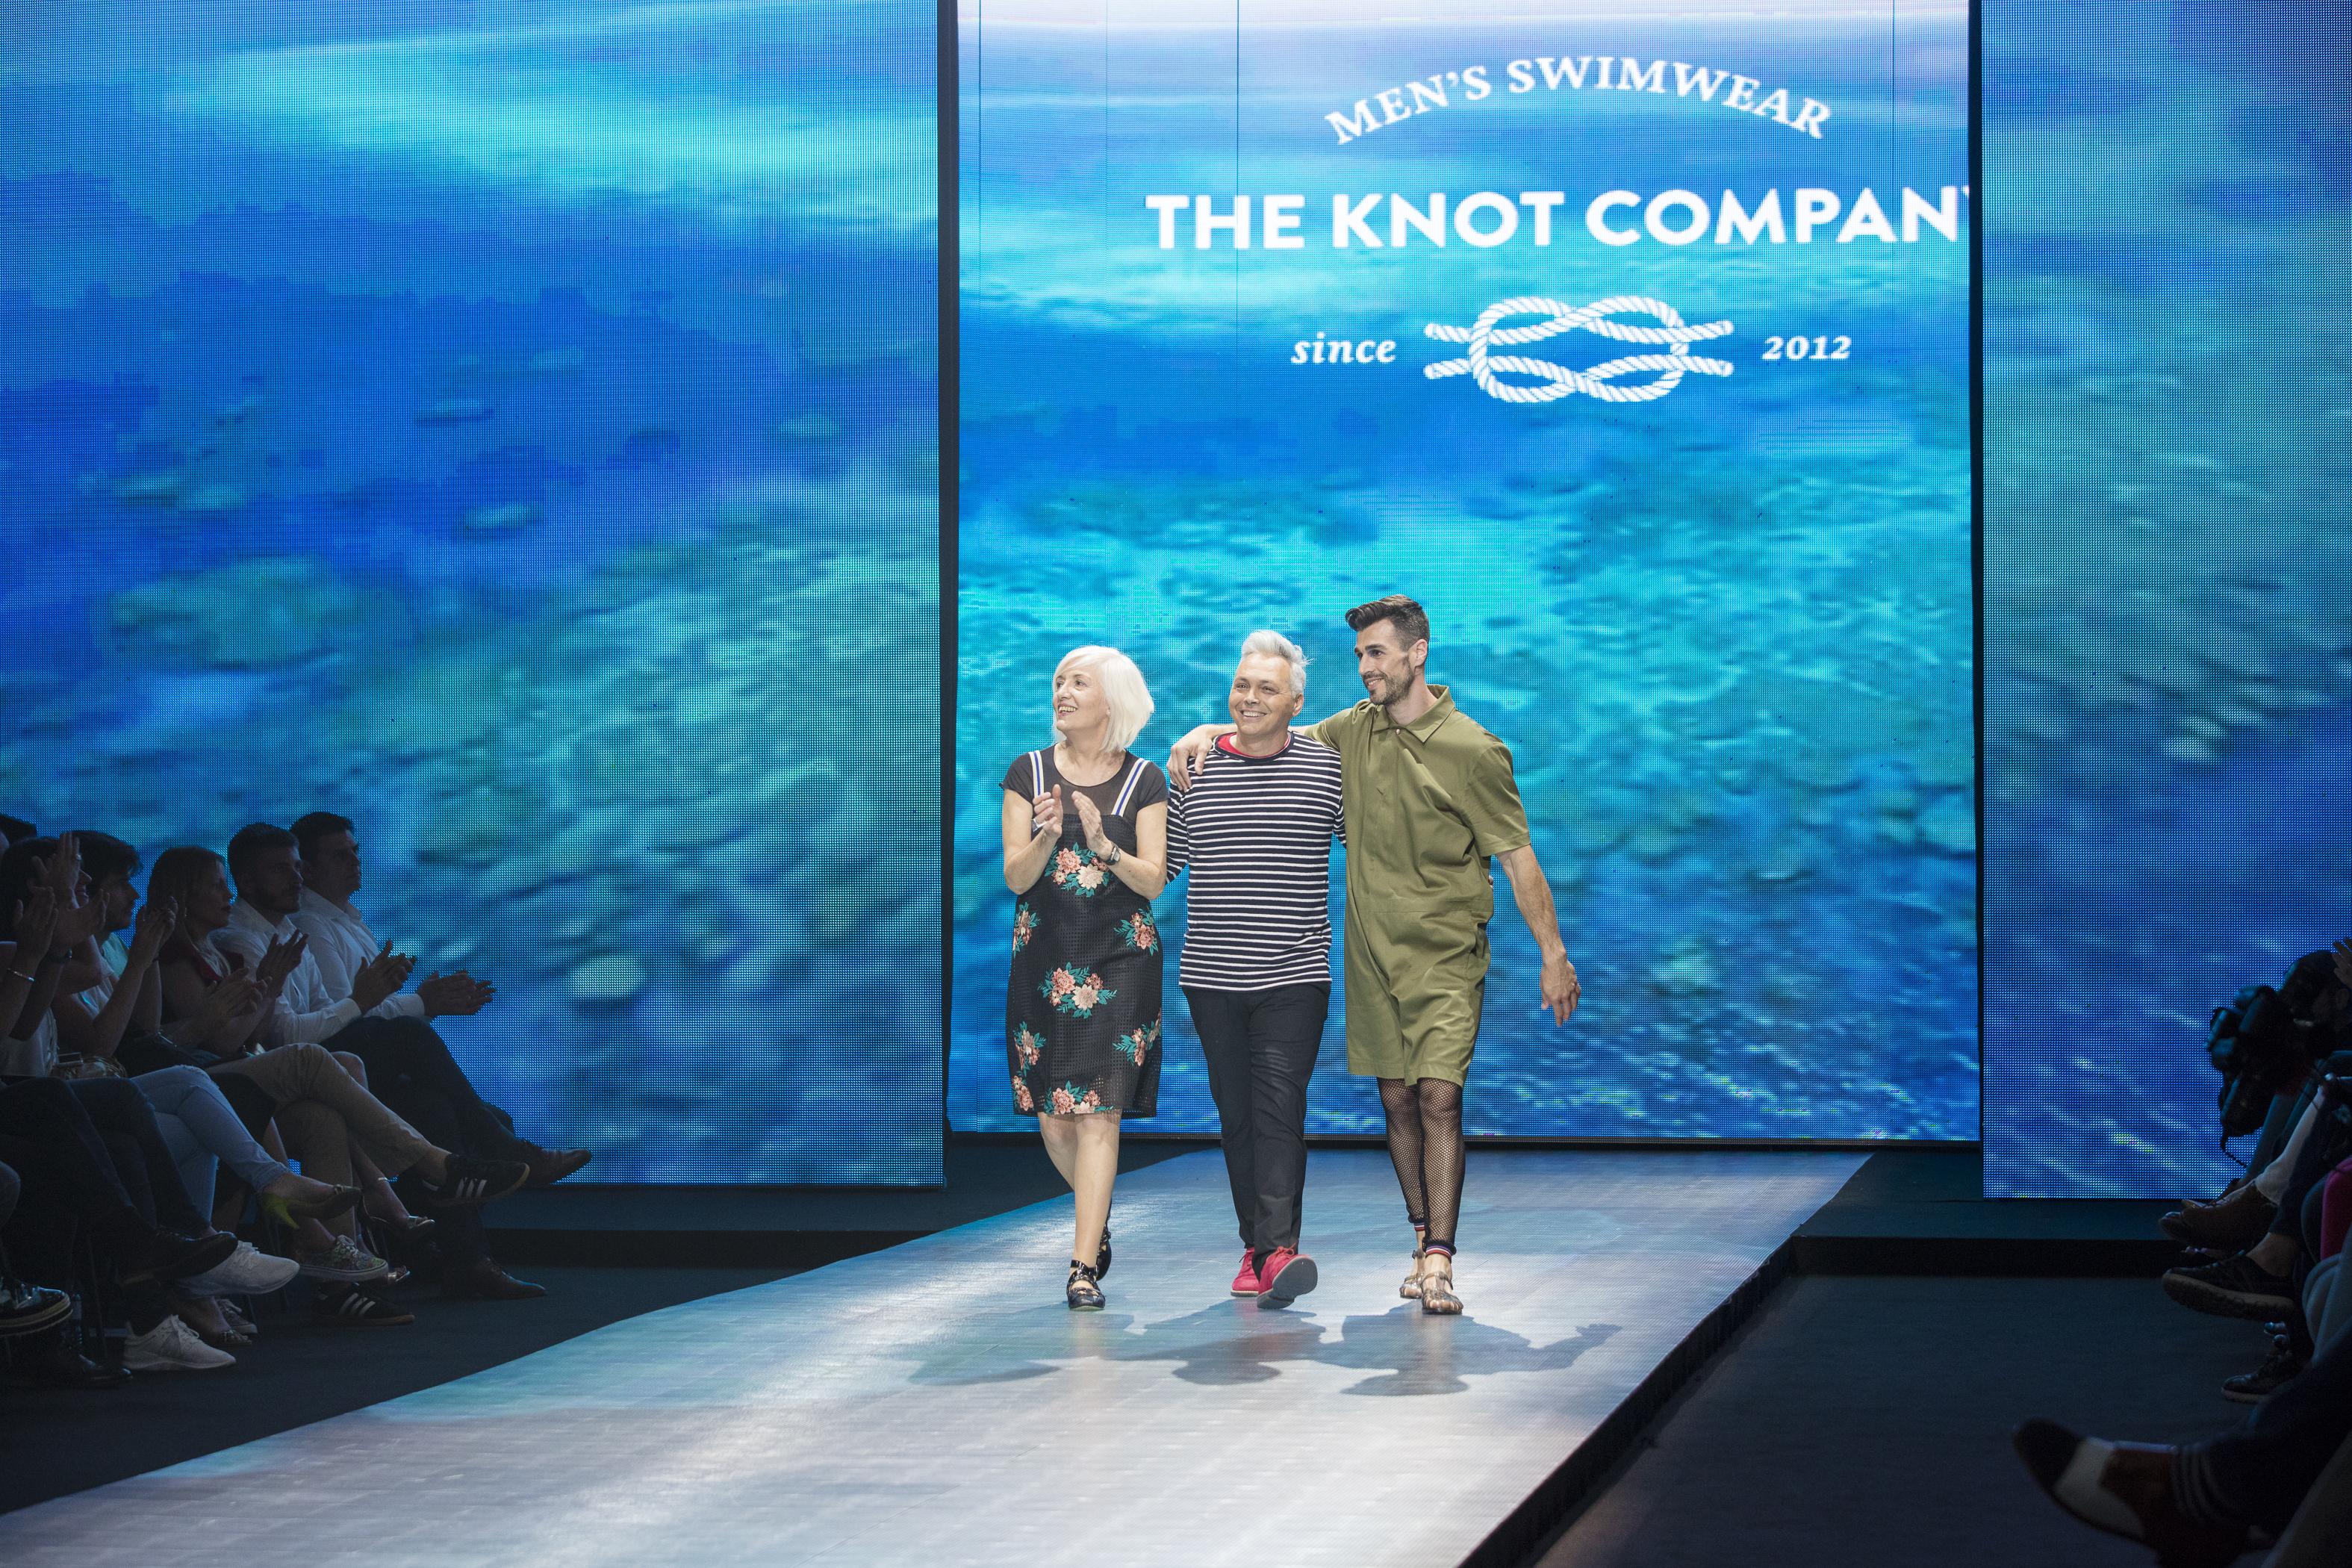 The Knot Company